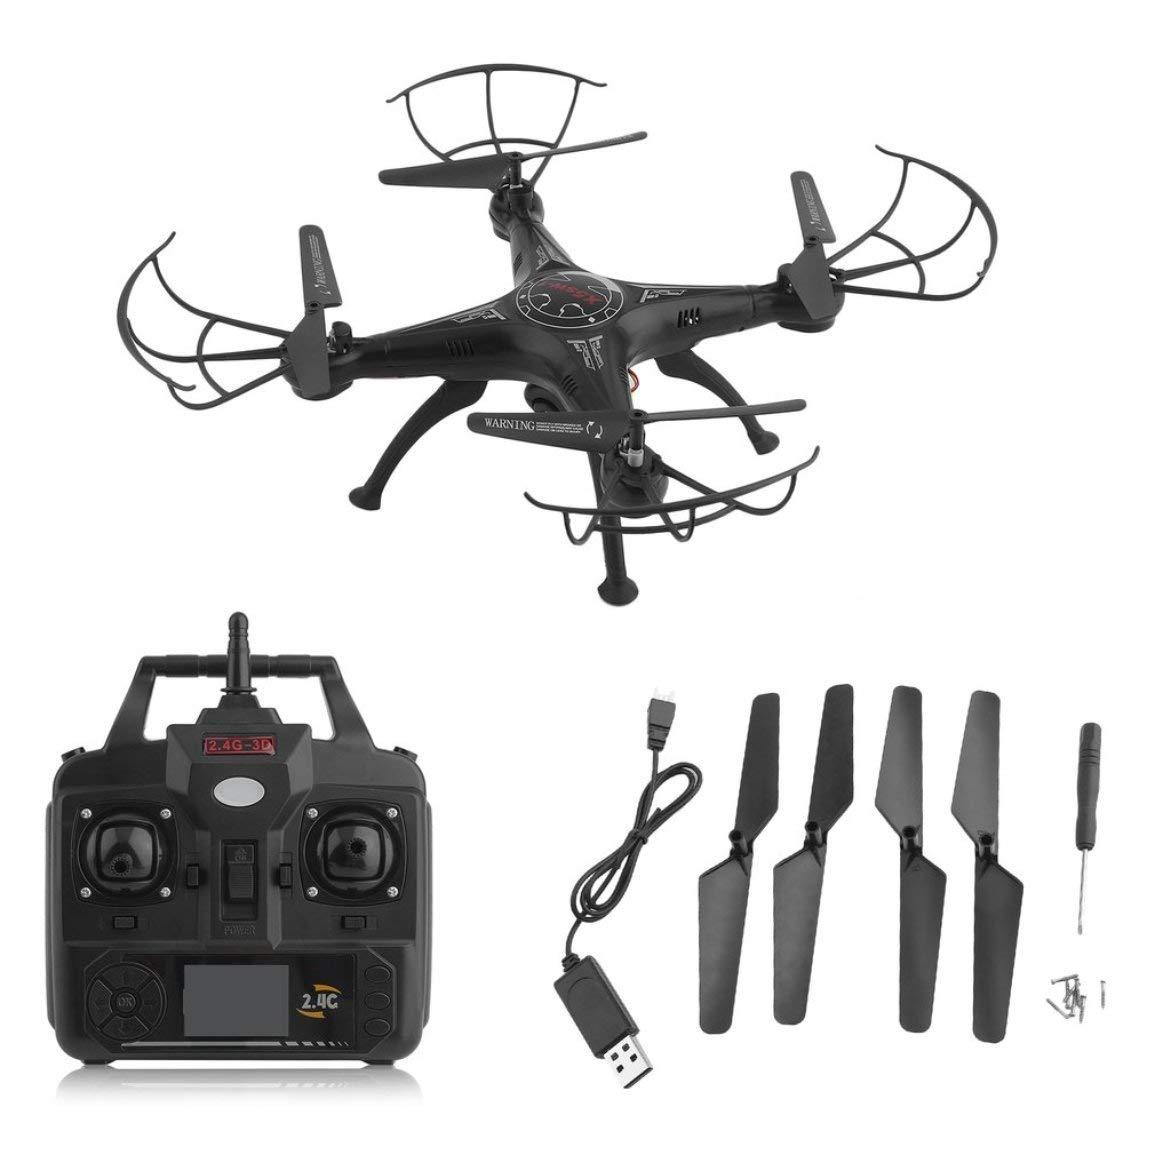 Fantasyworld X5SW-1 6-Achsen Gyro RC Quadcopter 2.4G 4 CH Drone Drone Drone Compact RC Hubschrauber mit 0.3MP Wifi FPV Kamera-Fotografie-Videogerät 0dcf3c